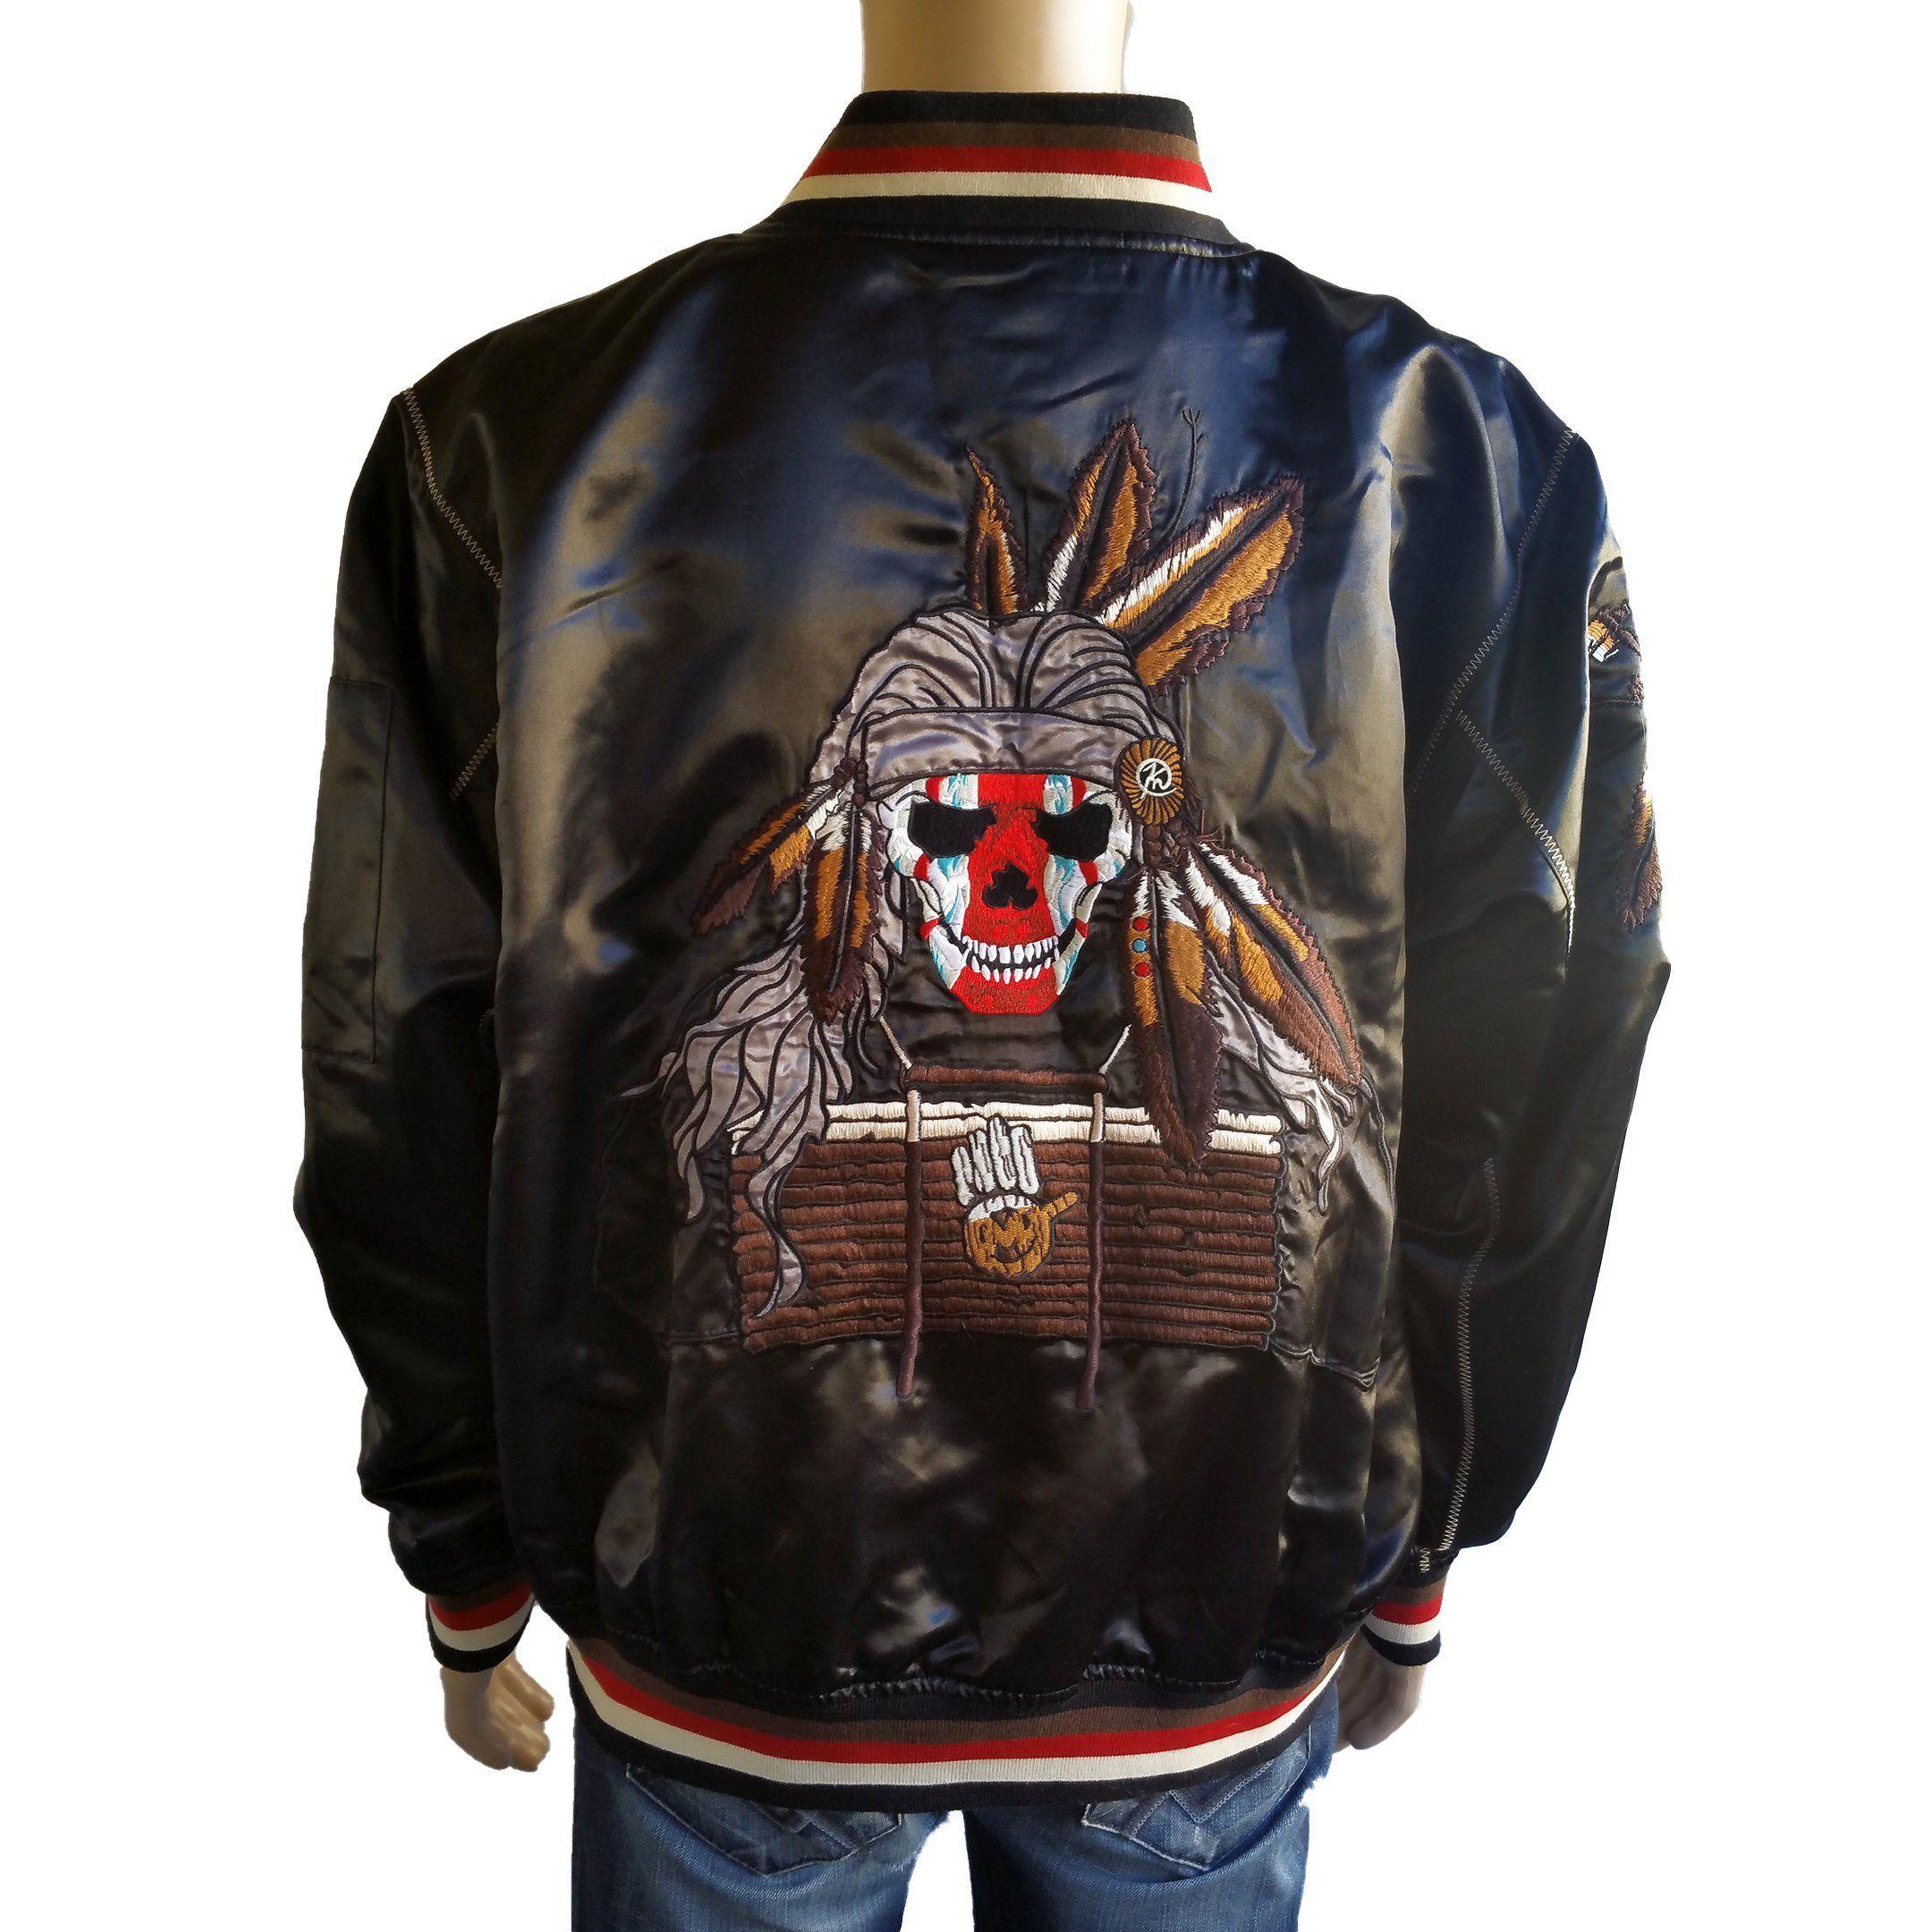 Vintage Miskeen Mens Satin Bomber Jacket Size Xl Indian Skull Embroidered Streetwear 90s Hip Hop Clothing By Satin Bomber Jacket Hip Hop Outfits Bomber Jacket [ 2160 x 2160 Pixel ]